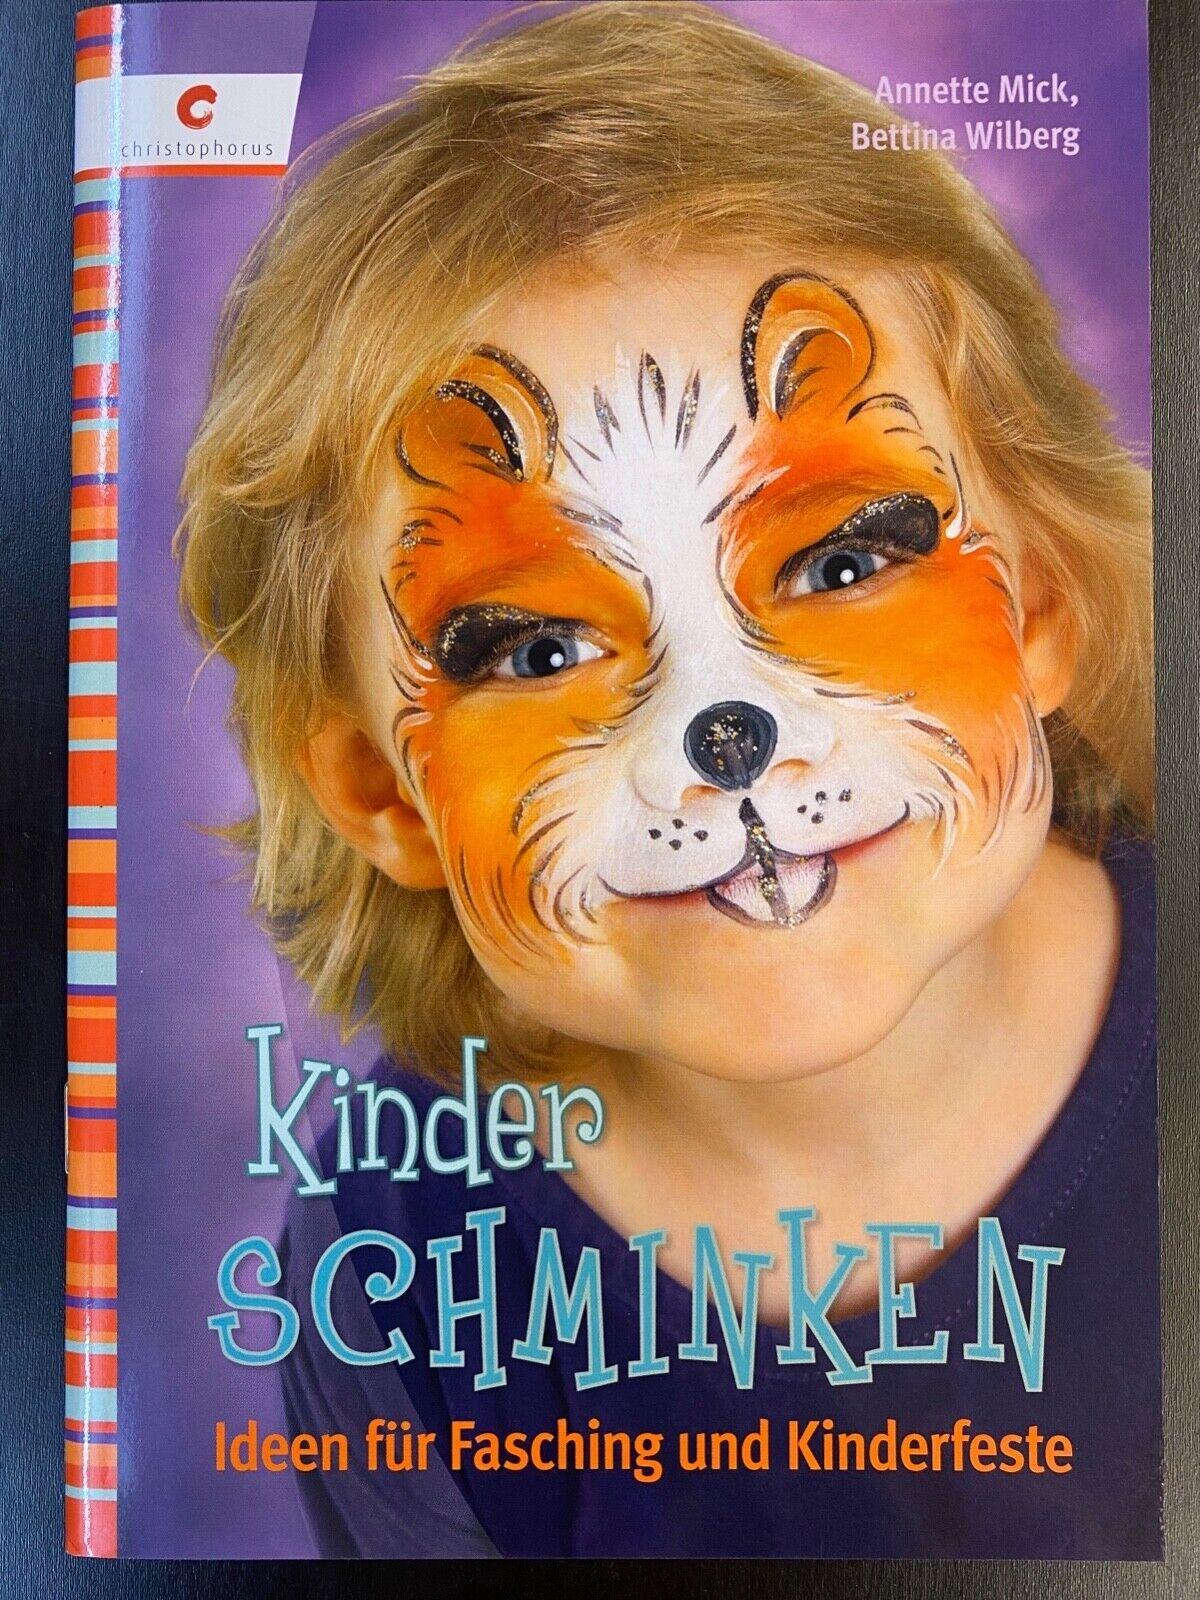 Annette Mick: Kinderschminken (Christpphorus, Taschenbuch, 2013) Zustand gut - Annette Mick